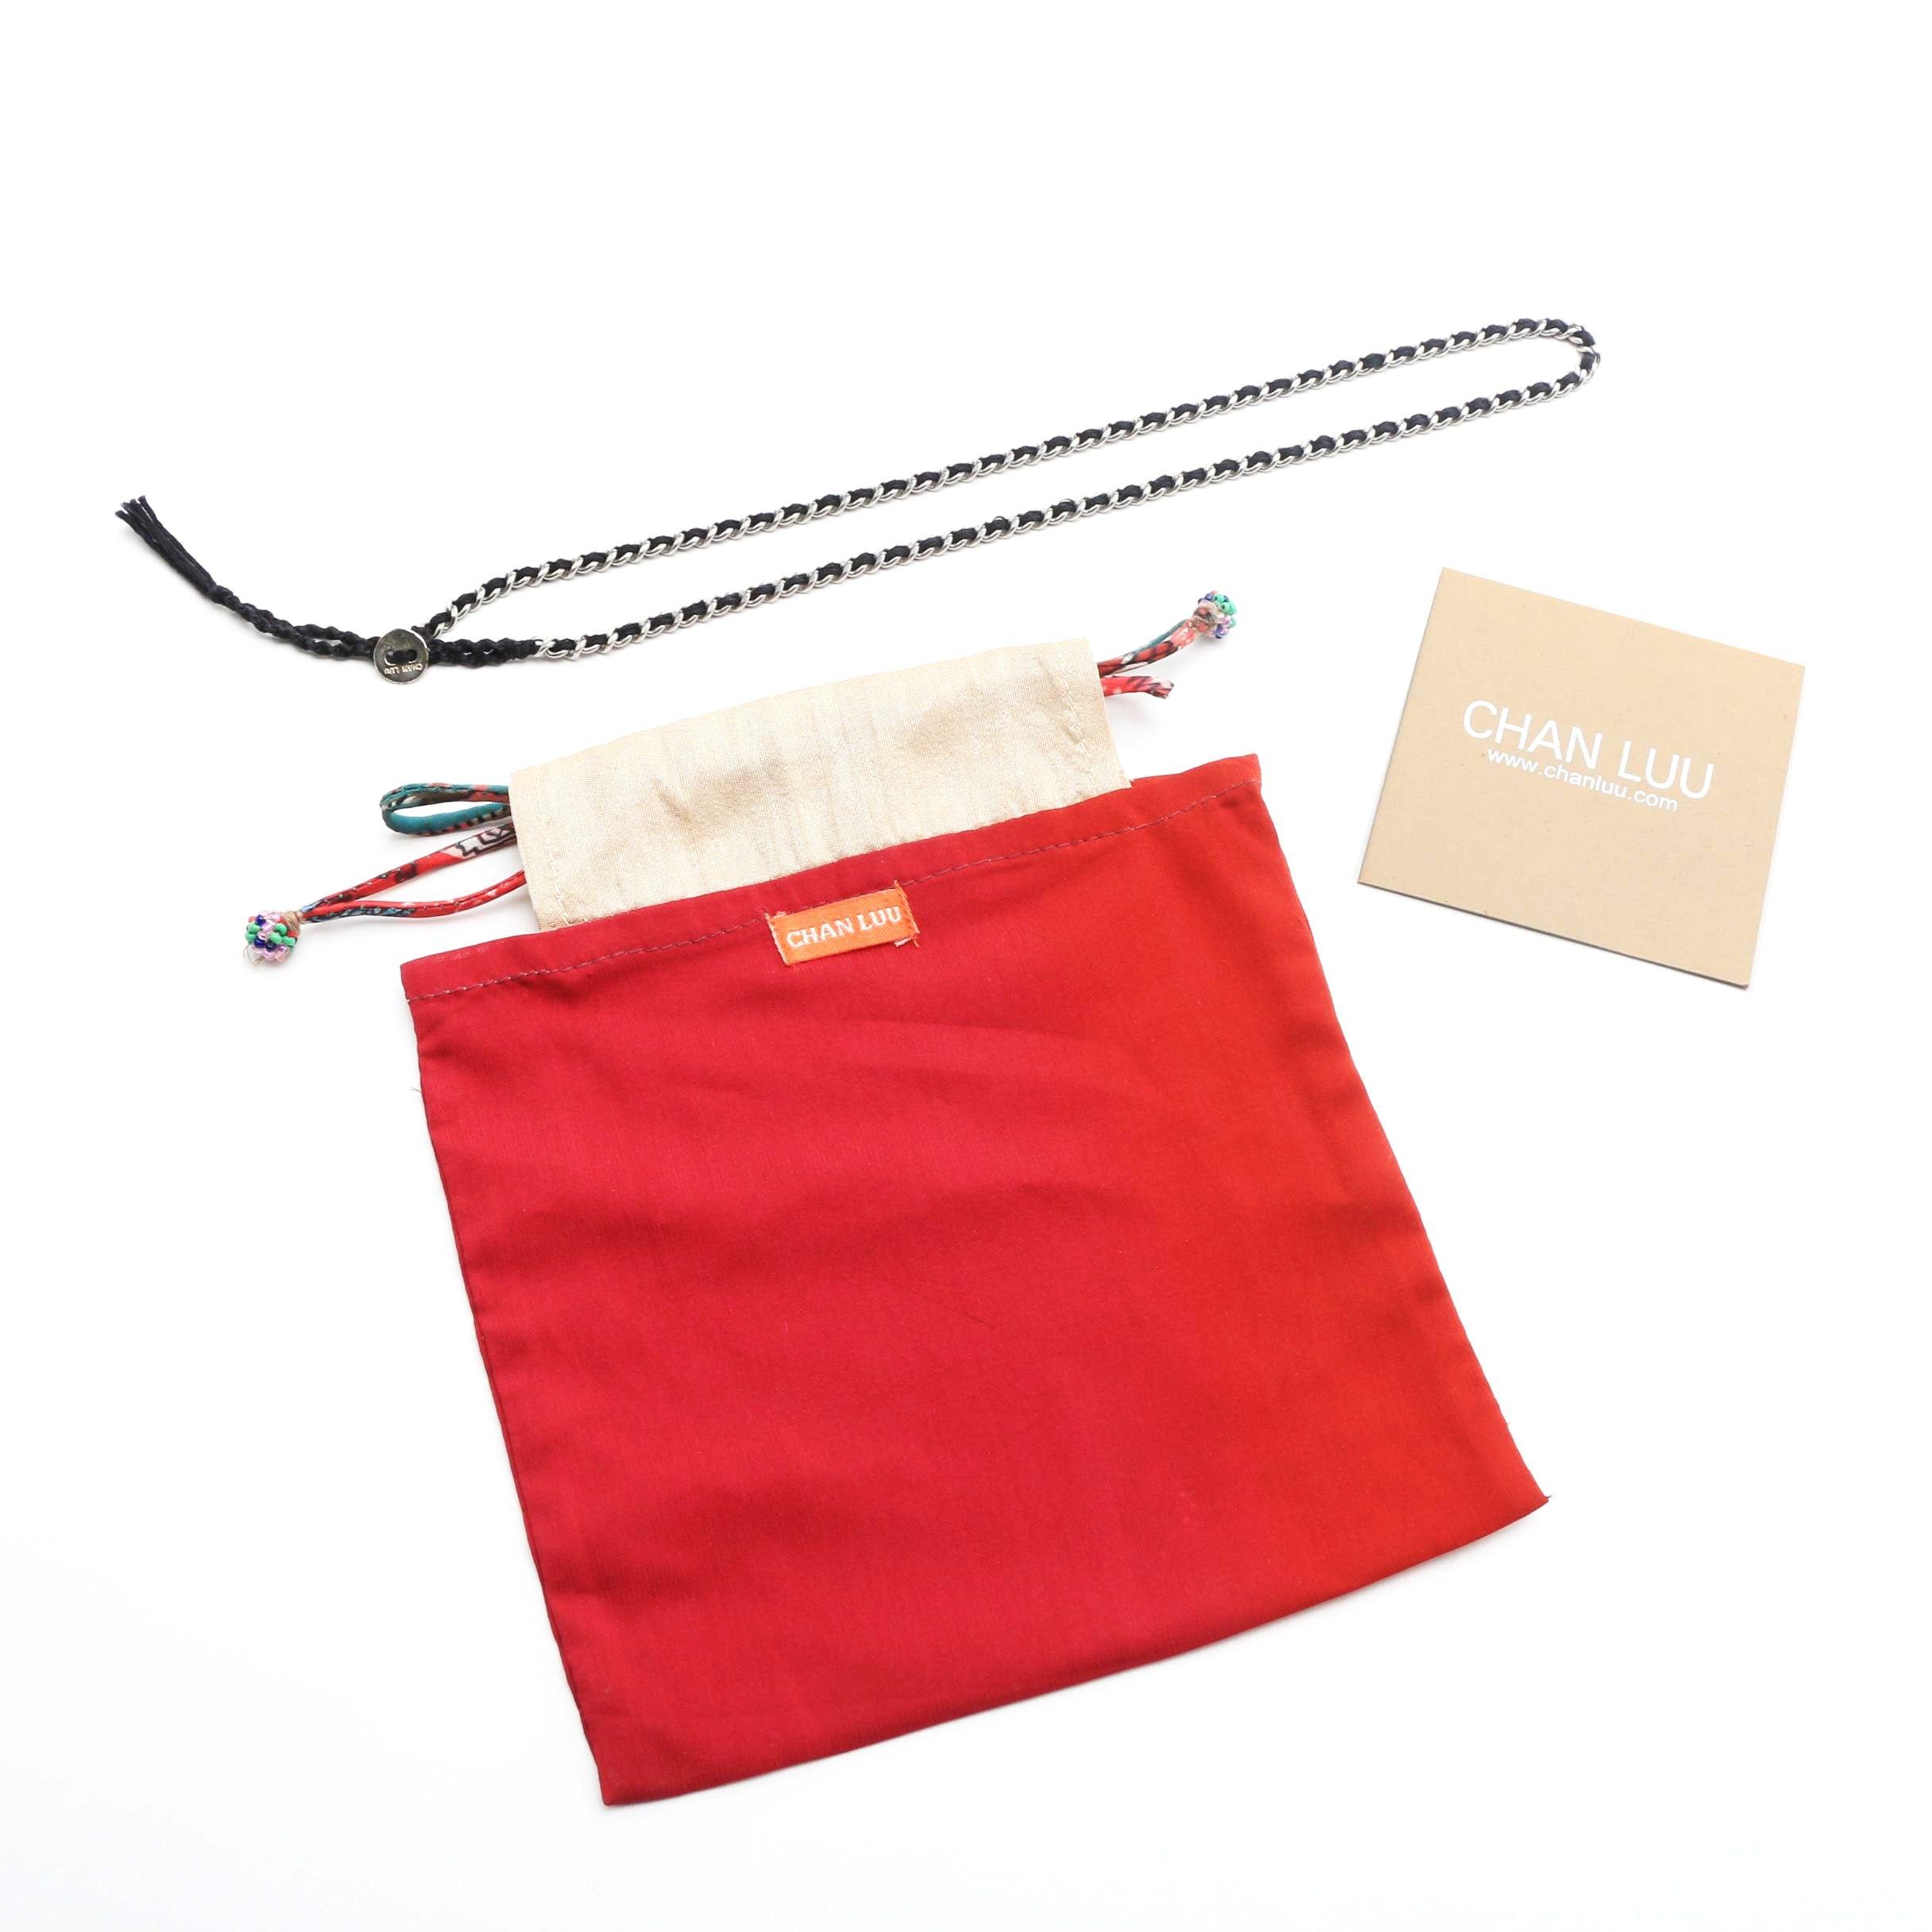 Chan Luu Wrap Bracelet in Black Braided Cord with Metal Chain